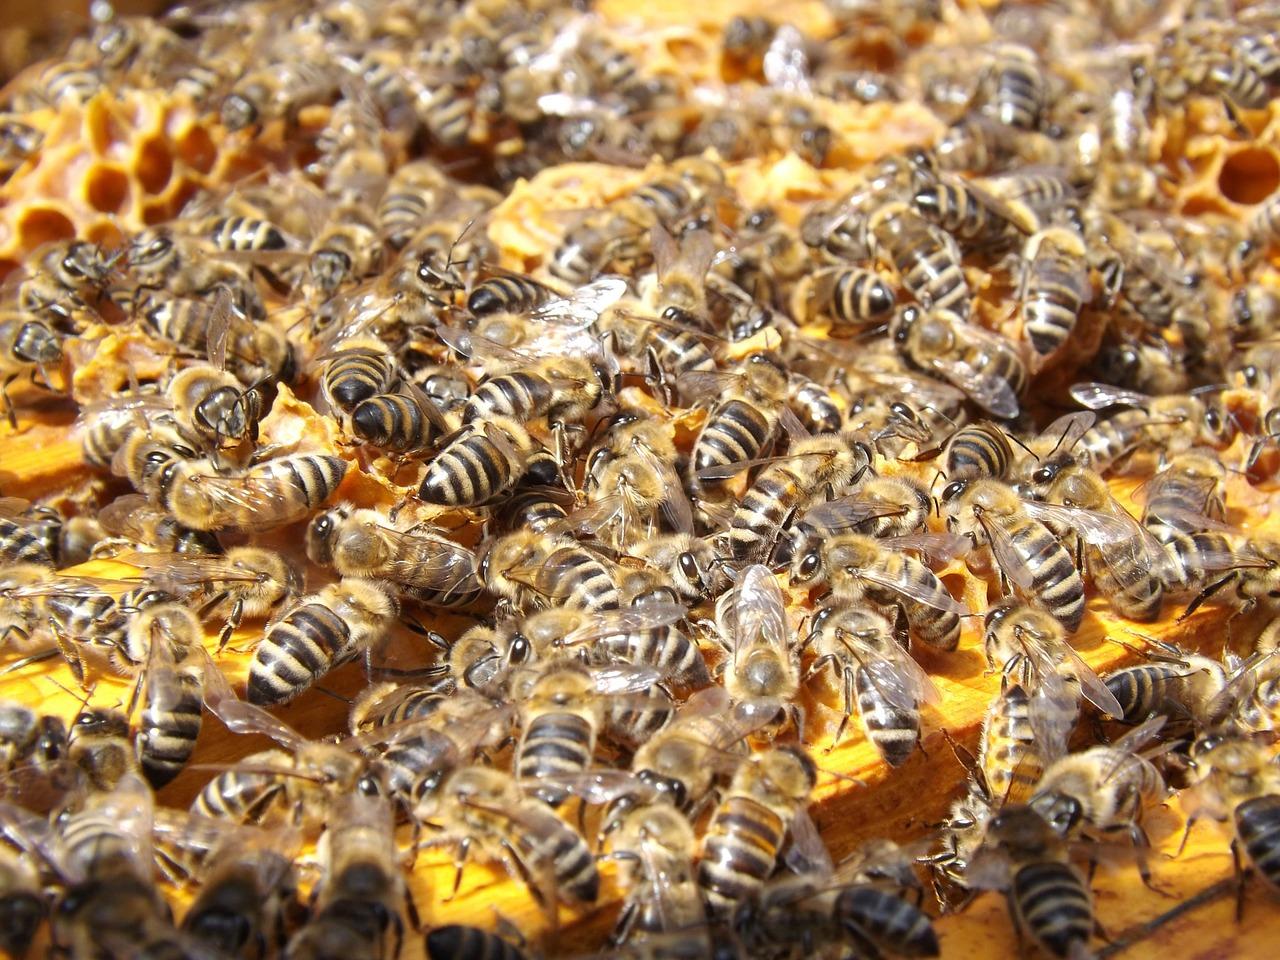 Honeybee populations might be in trouble as lands surrounding America's beekeeping hotspot undergo land development.